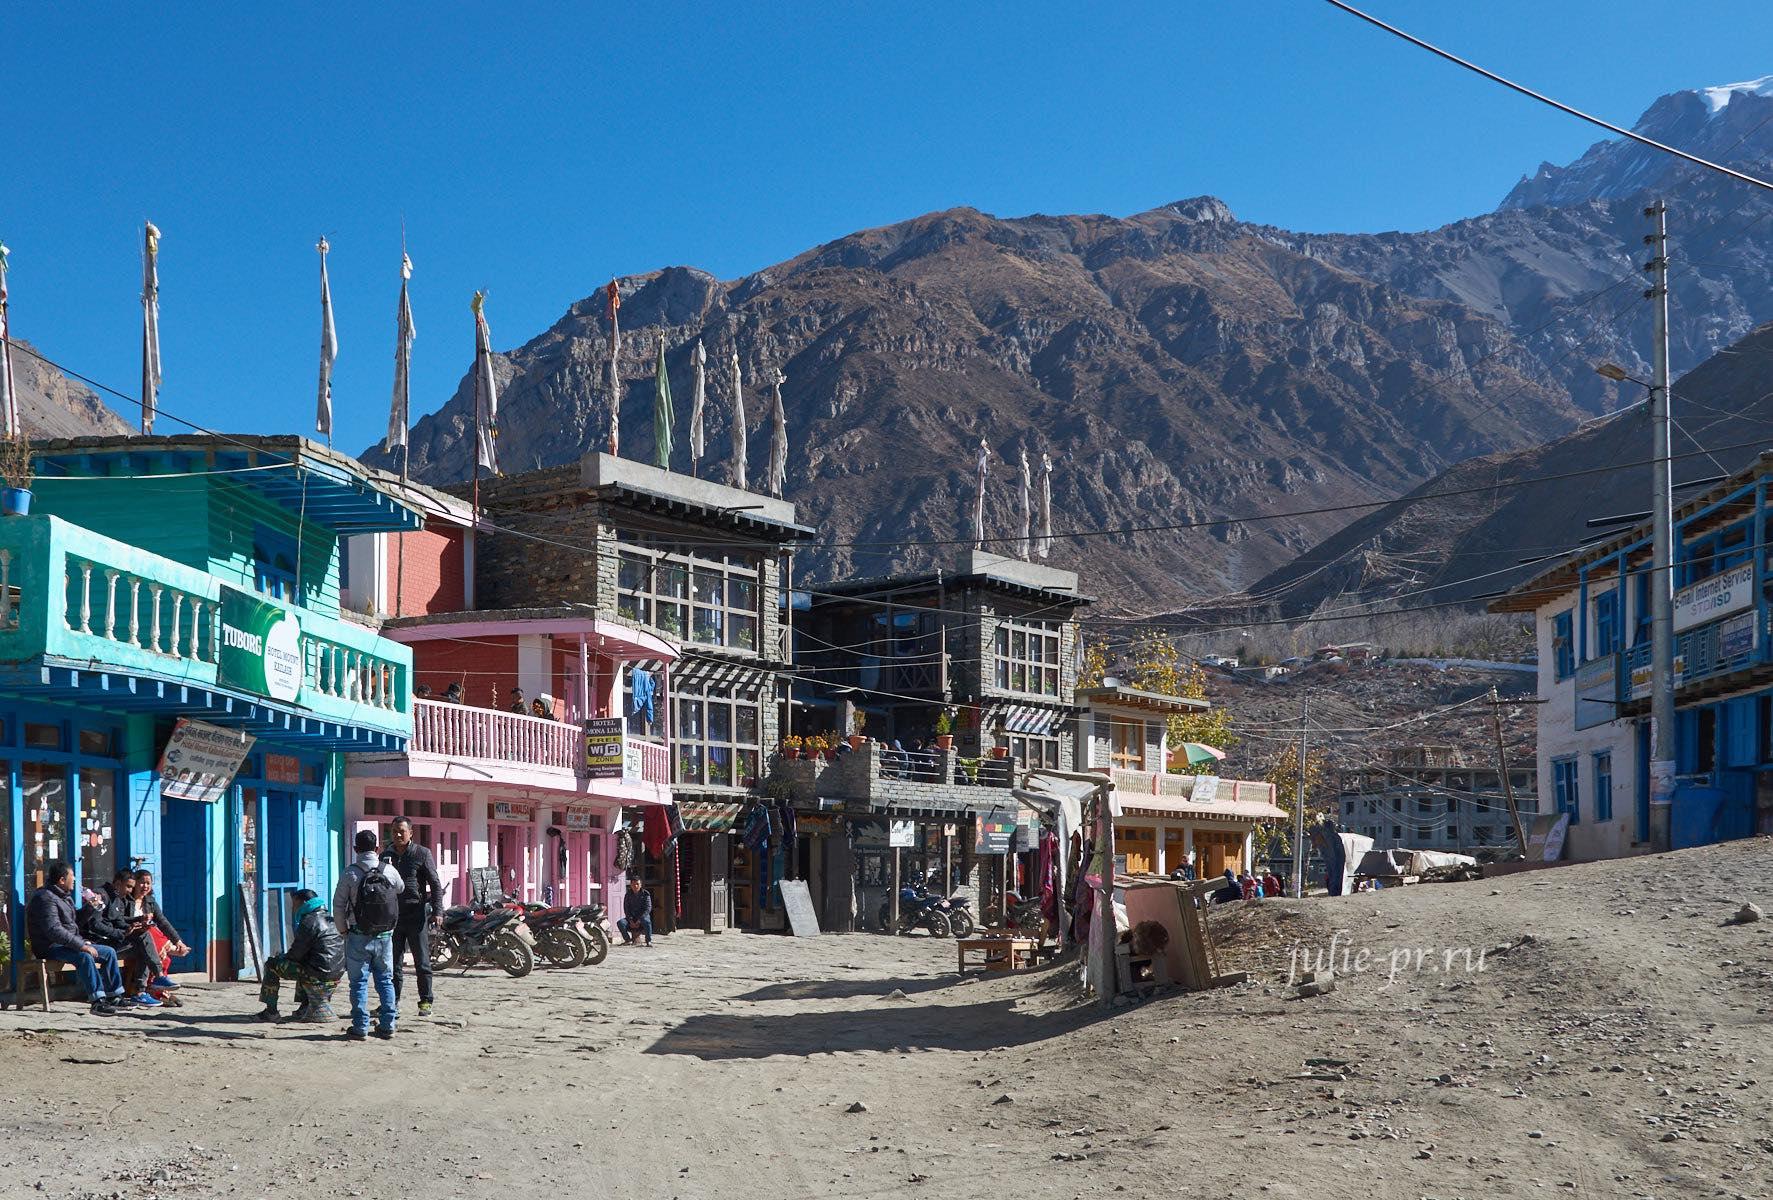 Непал, Ранипаува, Лоджии